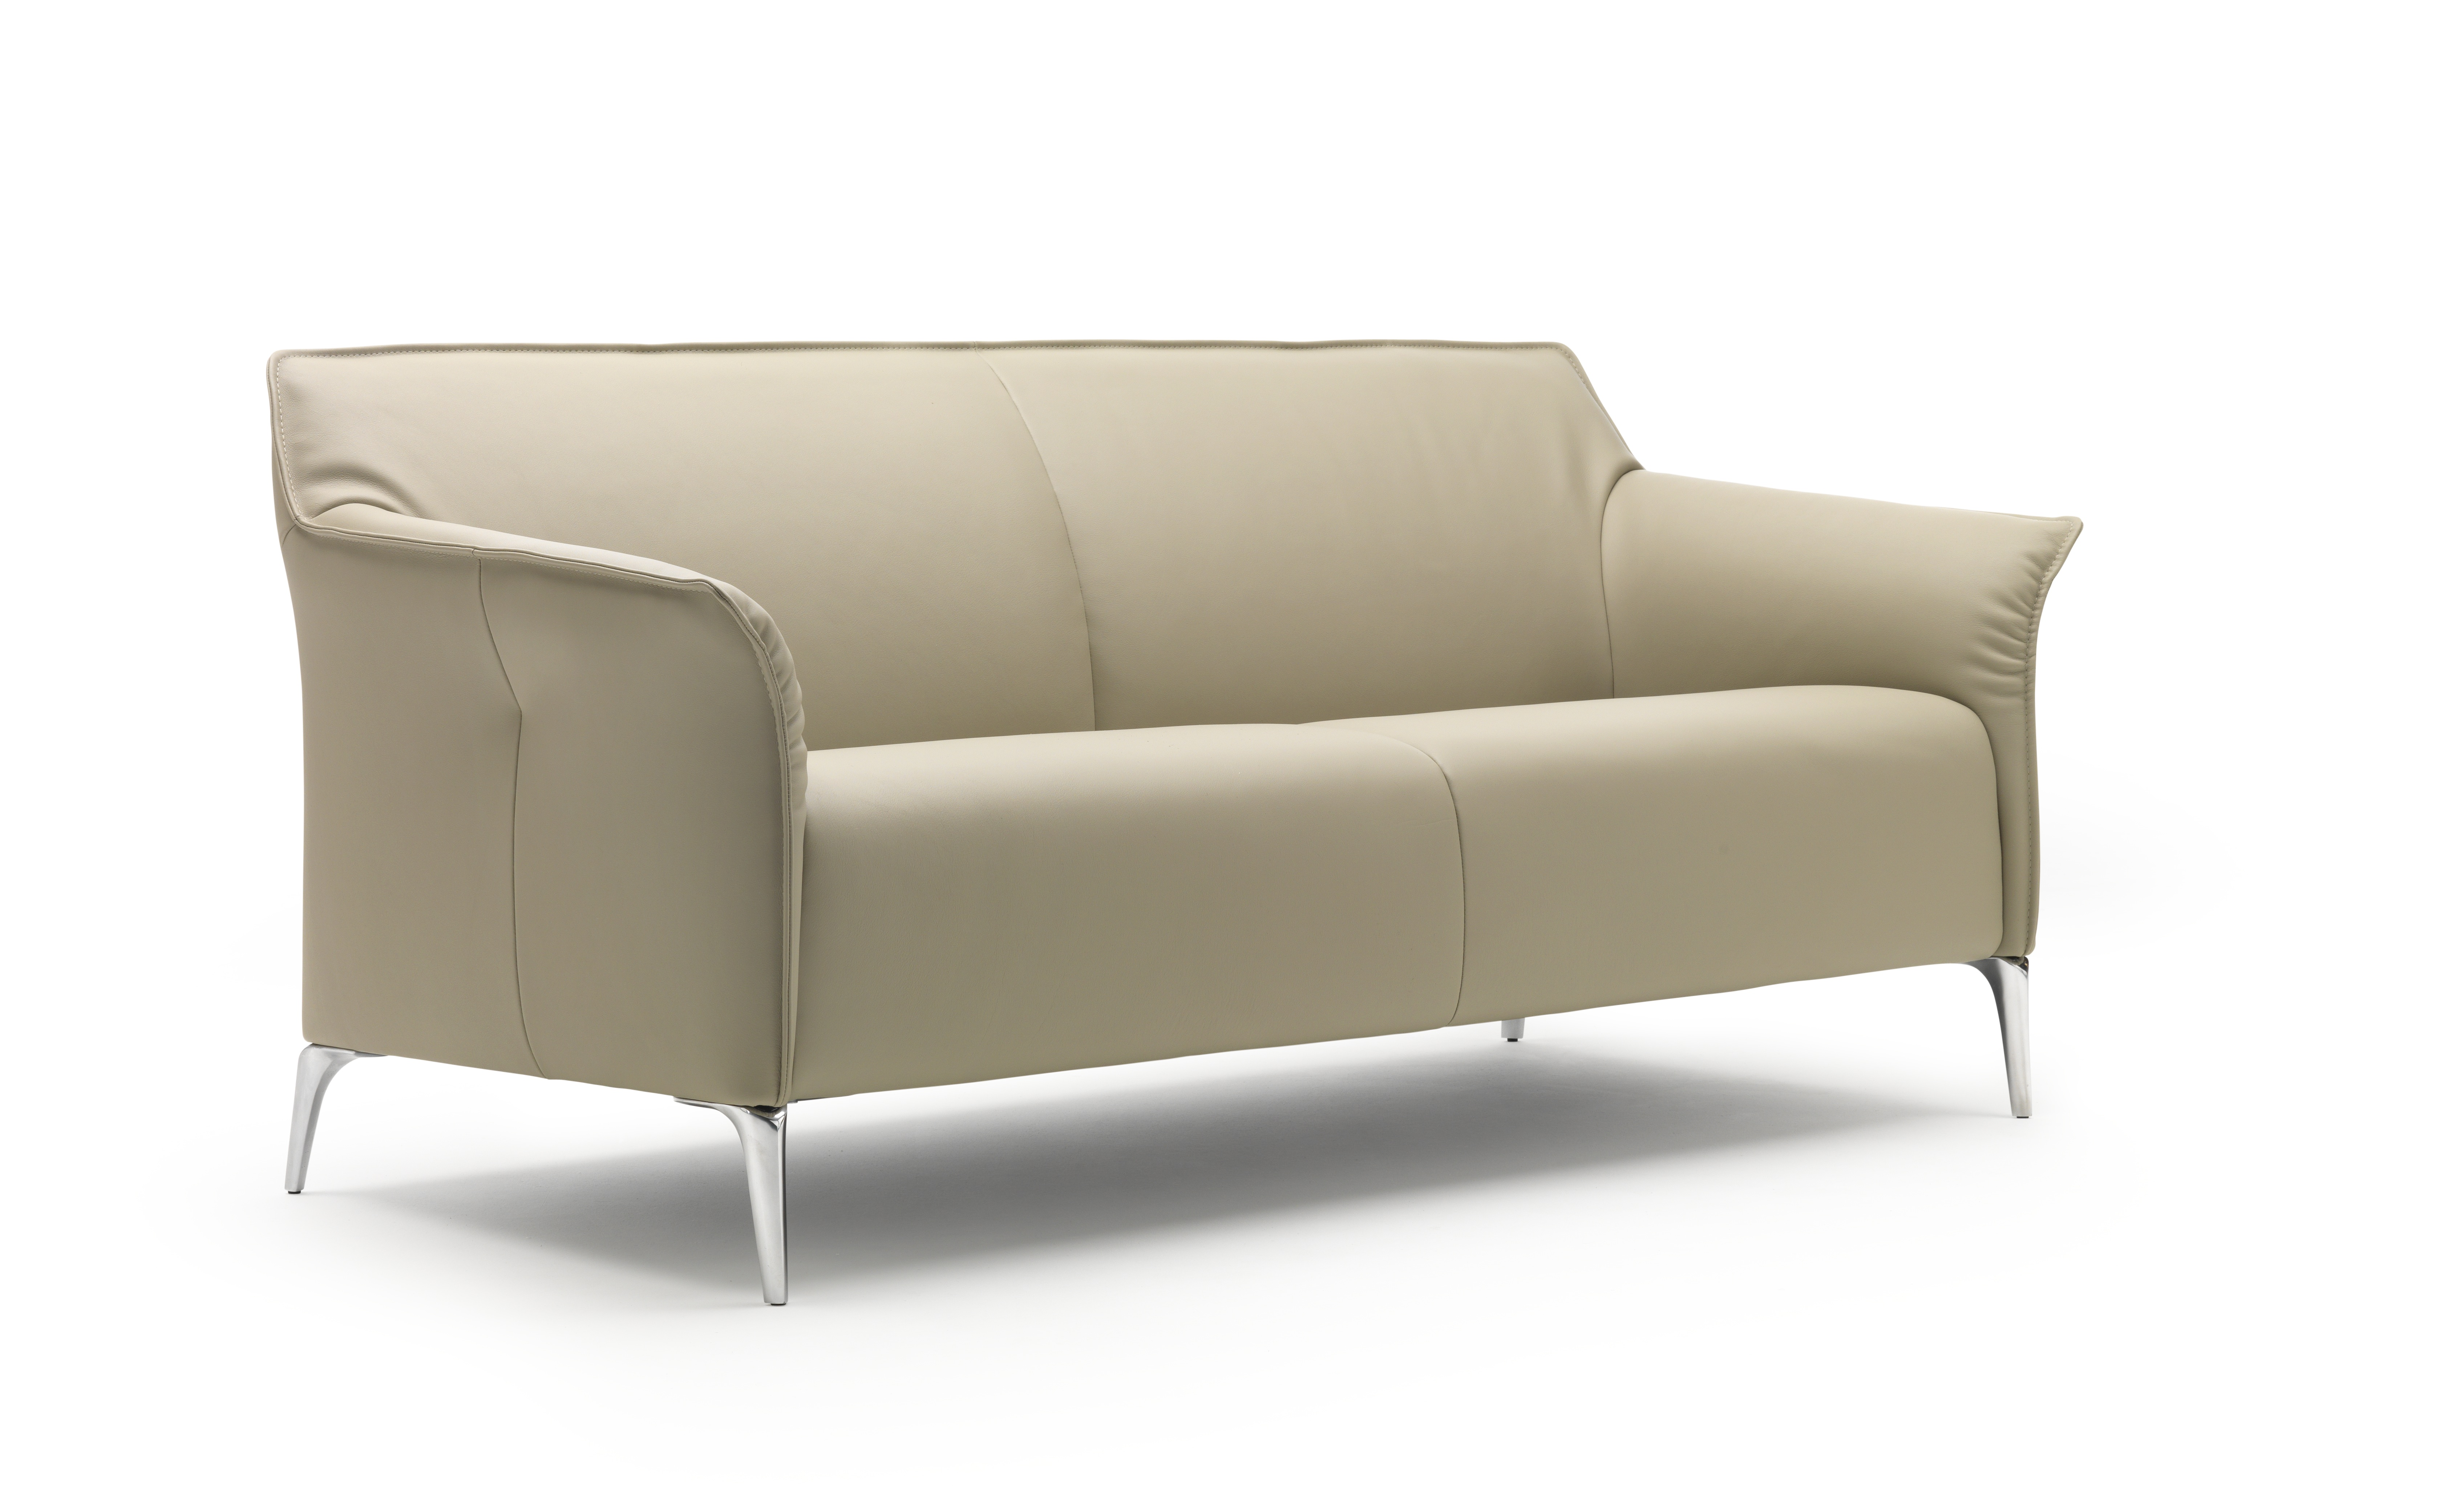 Leolux mayon zits bank leolux meubelen specialist leoline